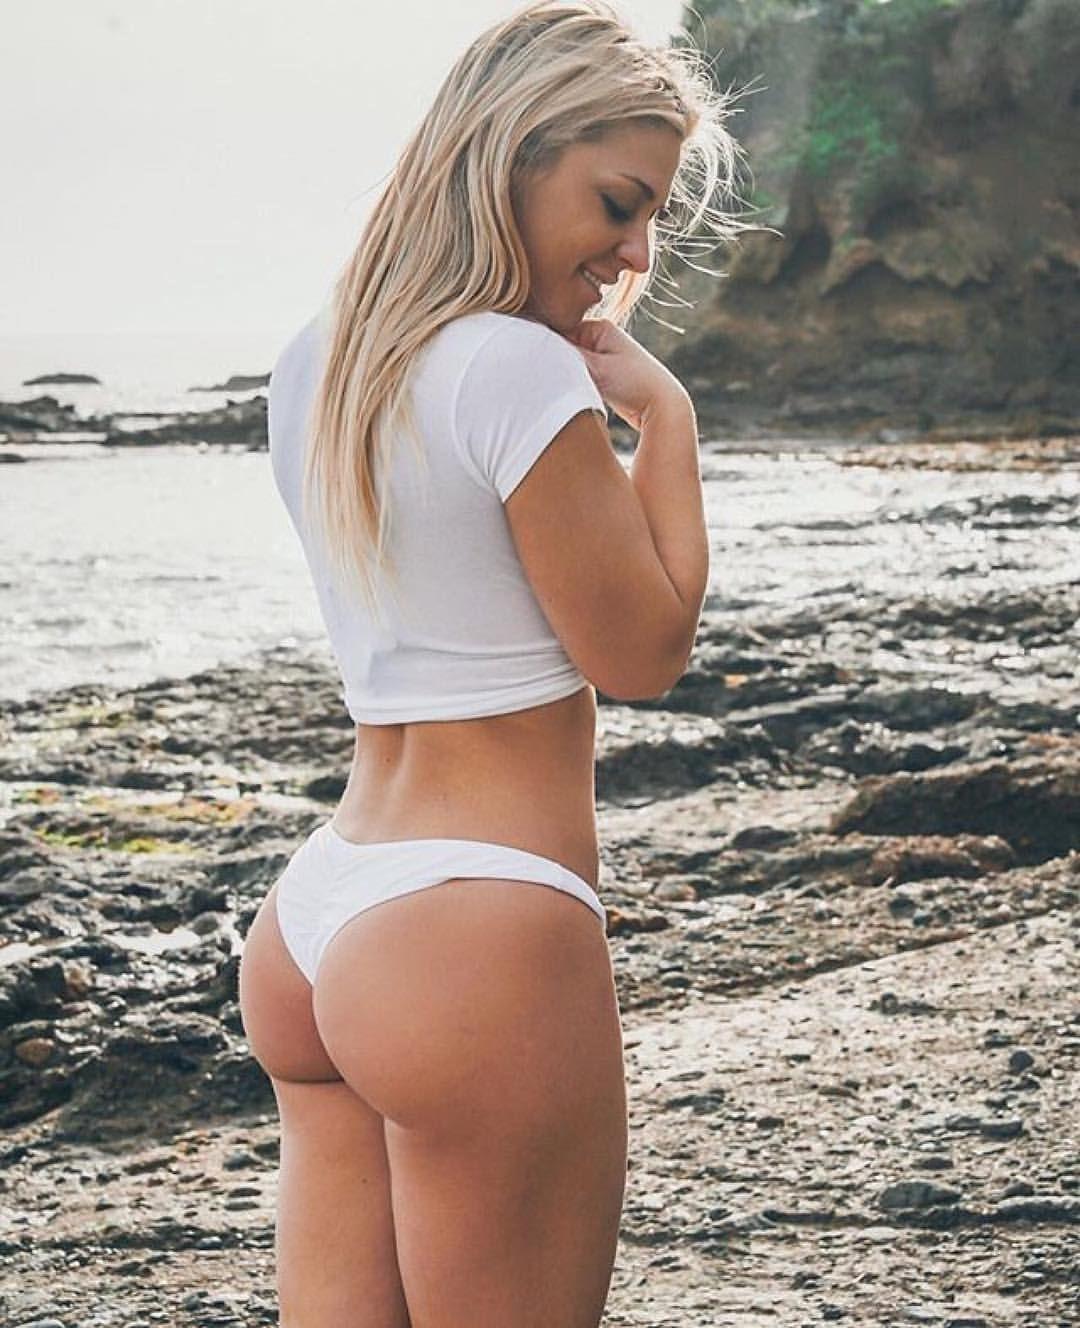 Nice firm ass or fat dimplecellulite ass